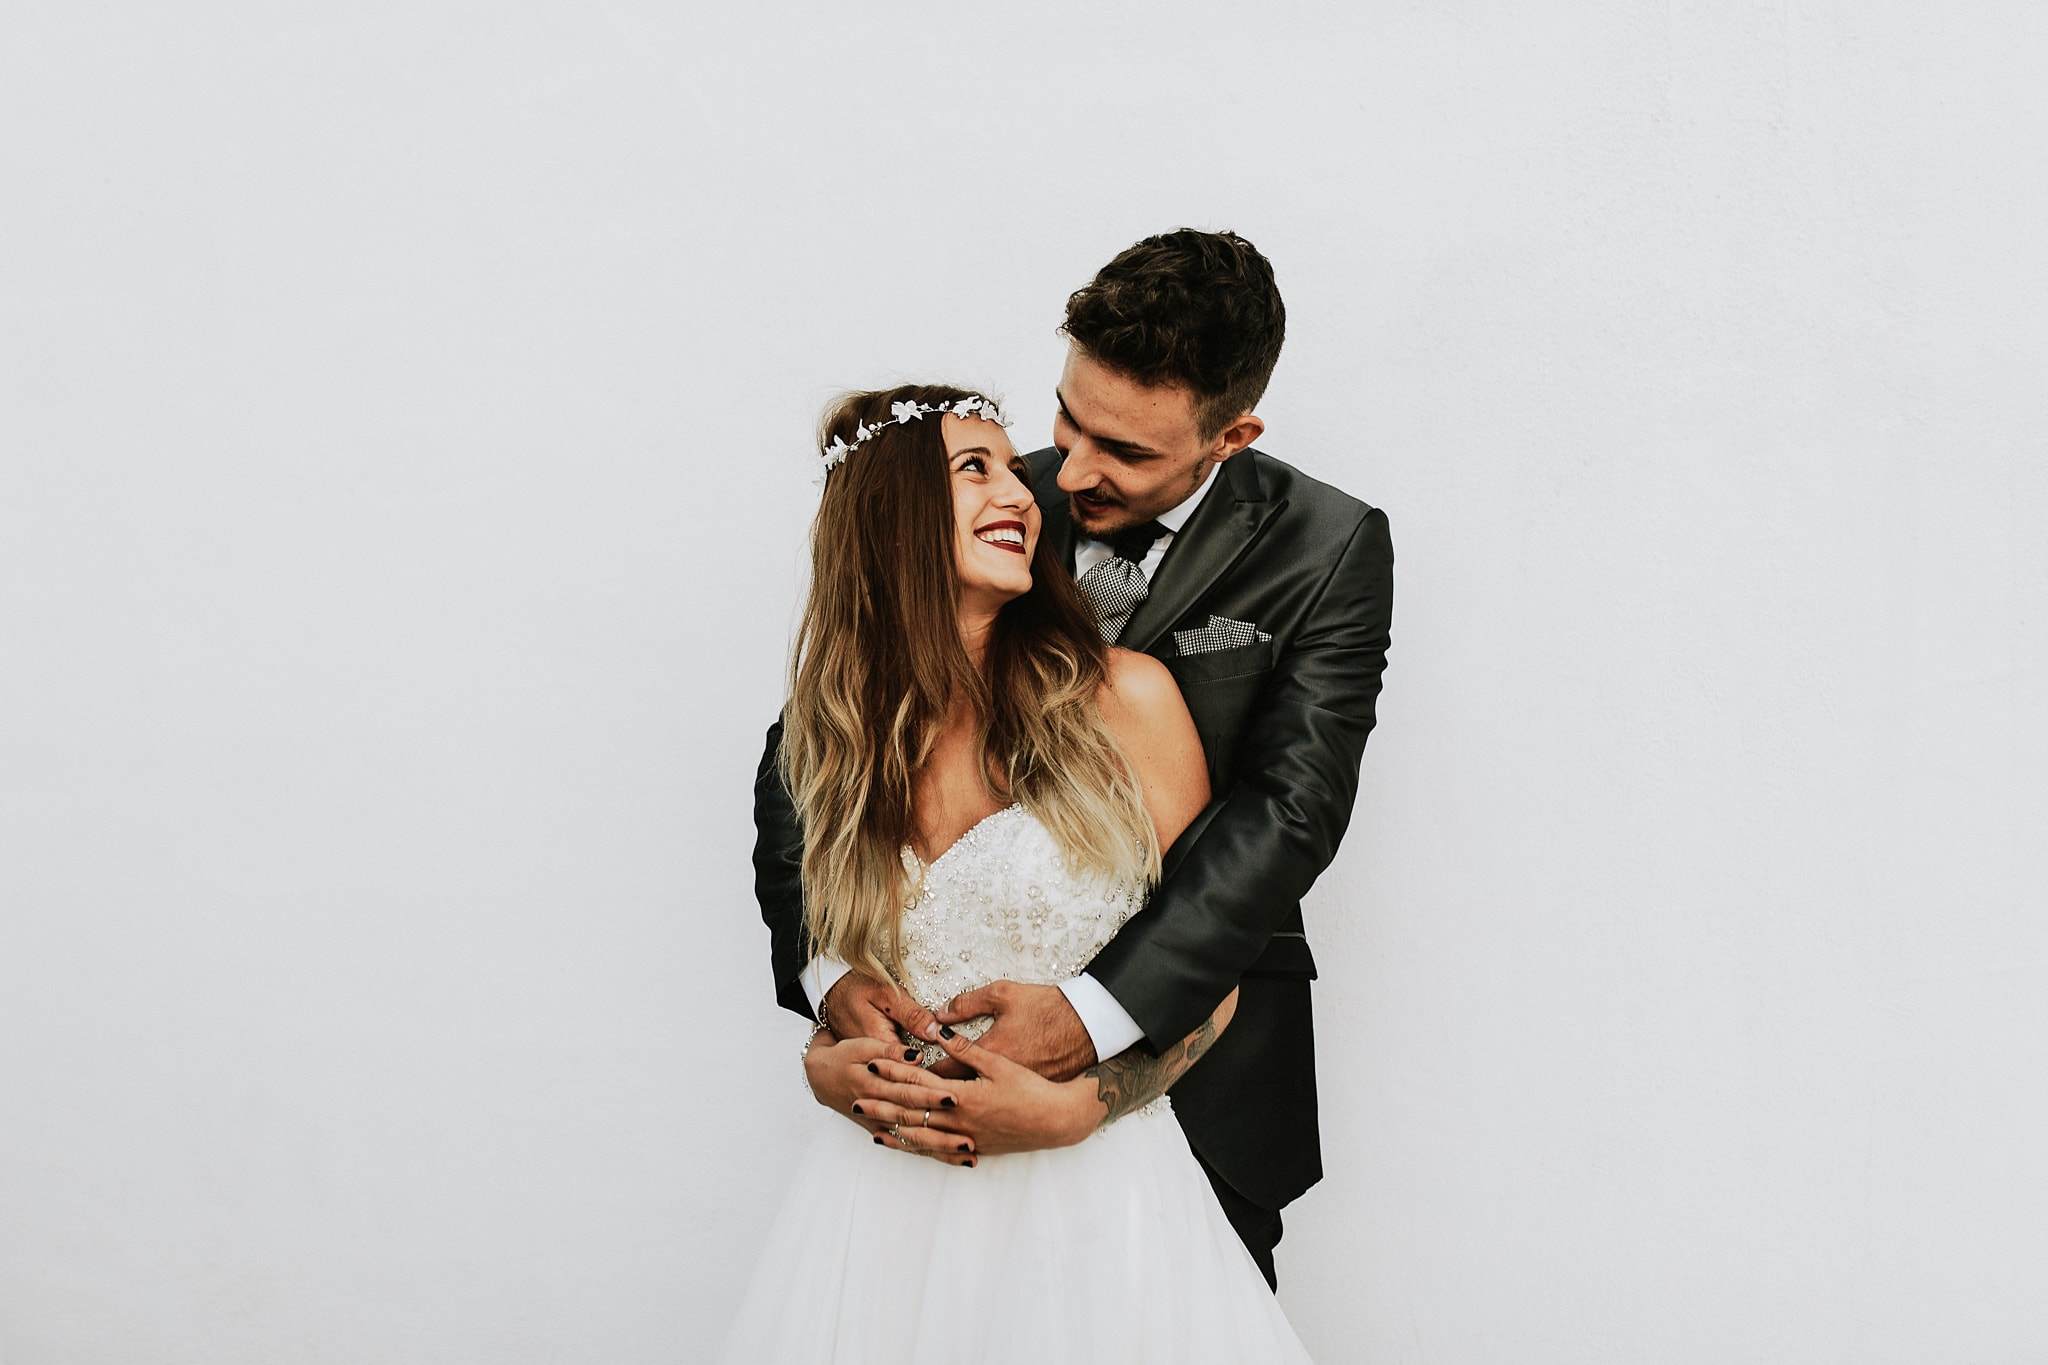 prisma-blanco-altea-wedding-photographer-35